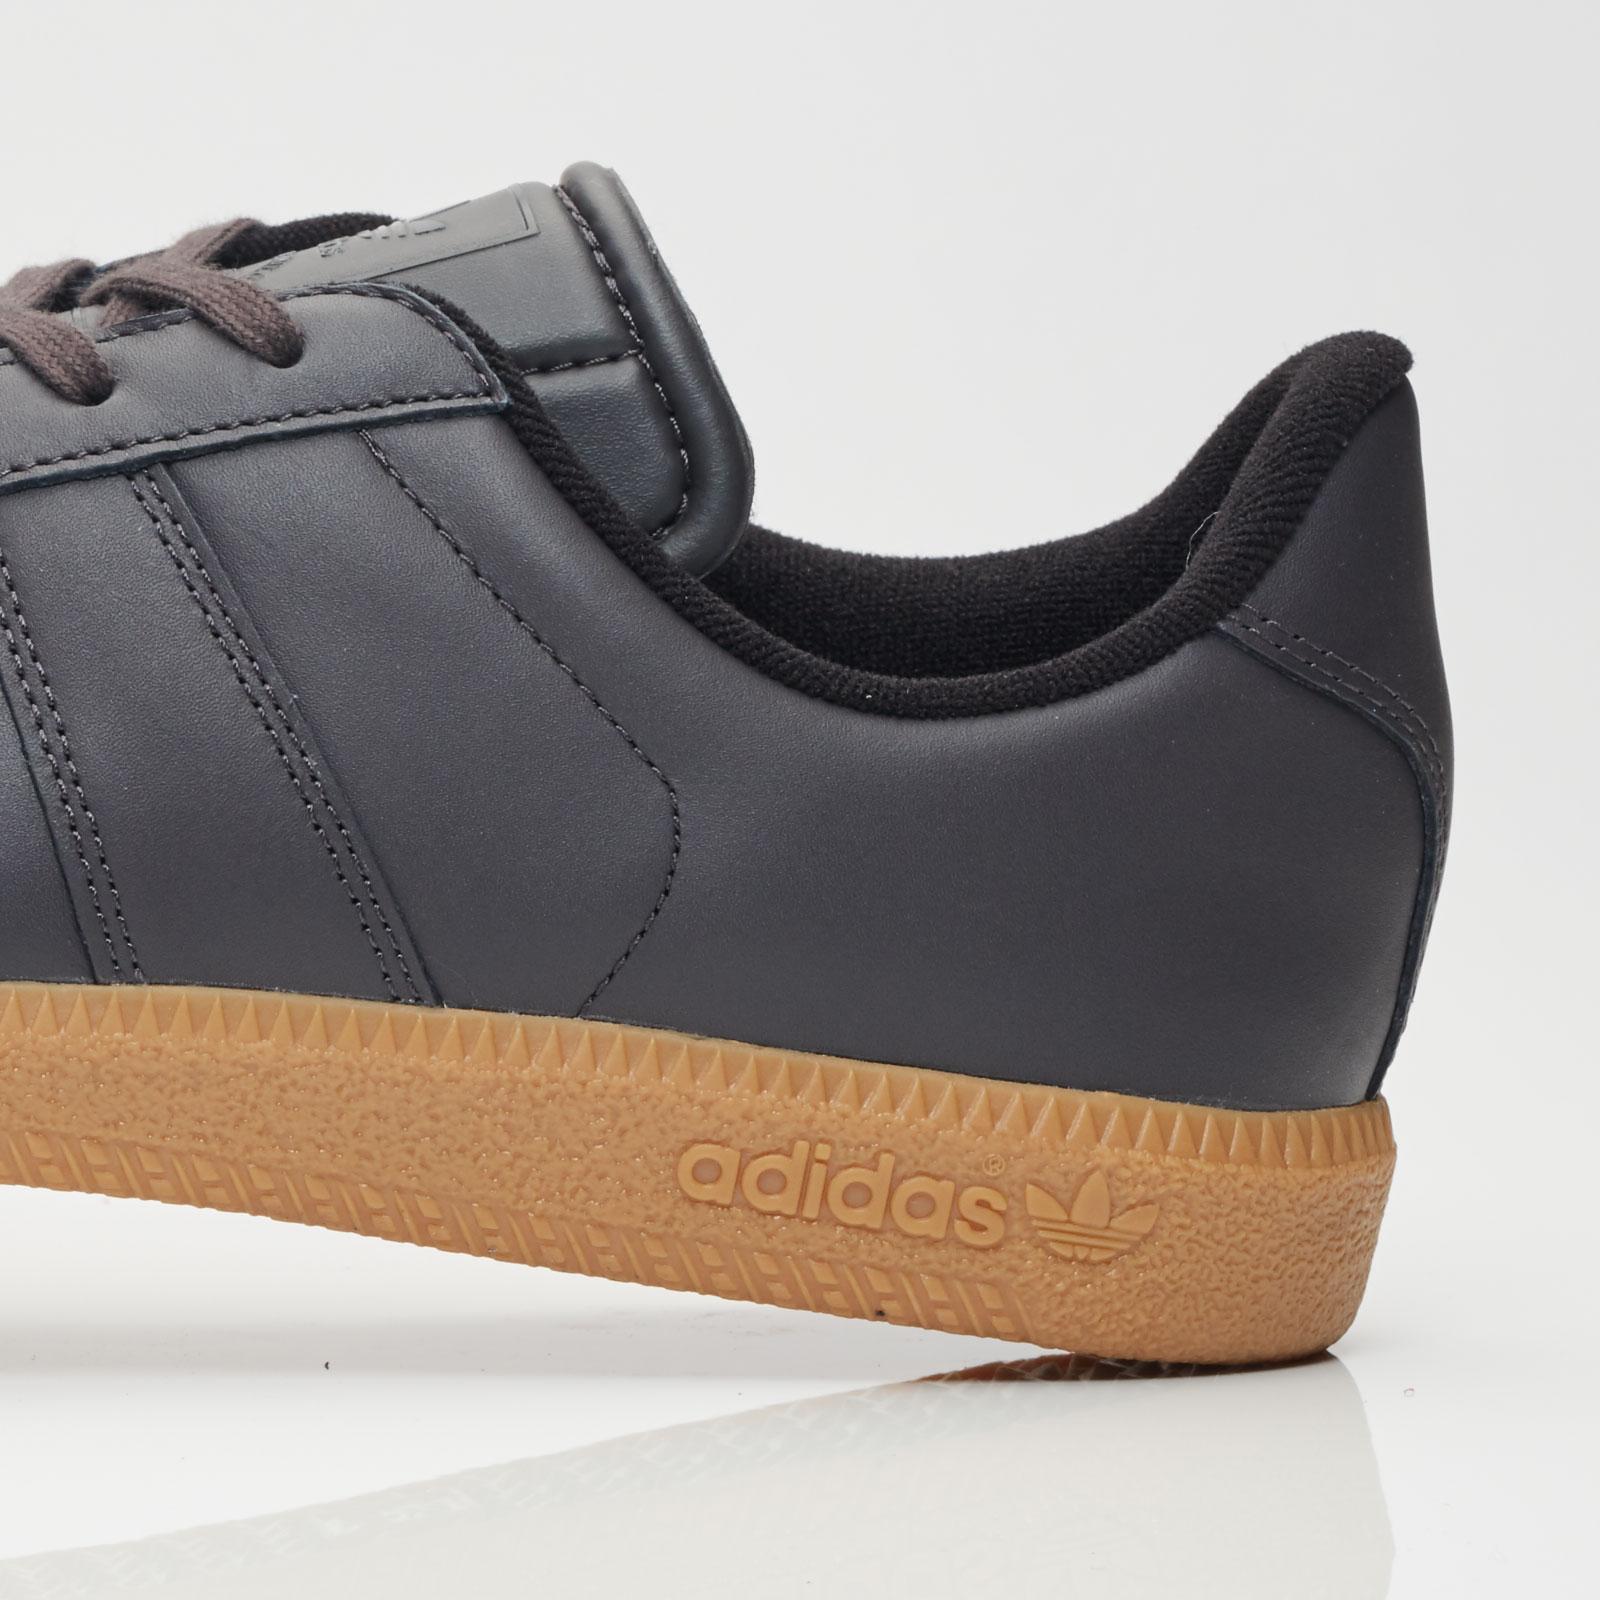 9846c60db02 adidas BW Army - Bz0580 - Sneakersnstuff